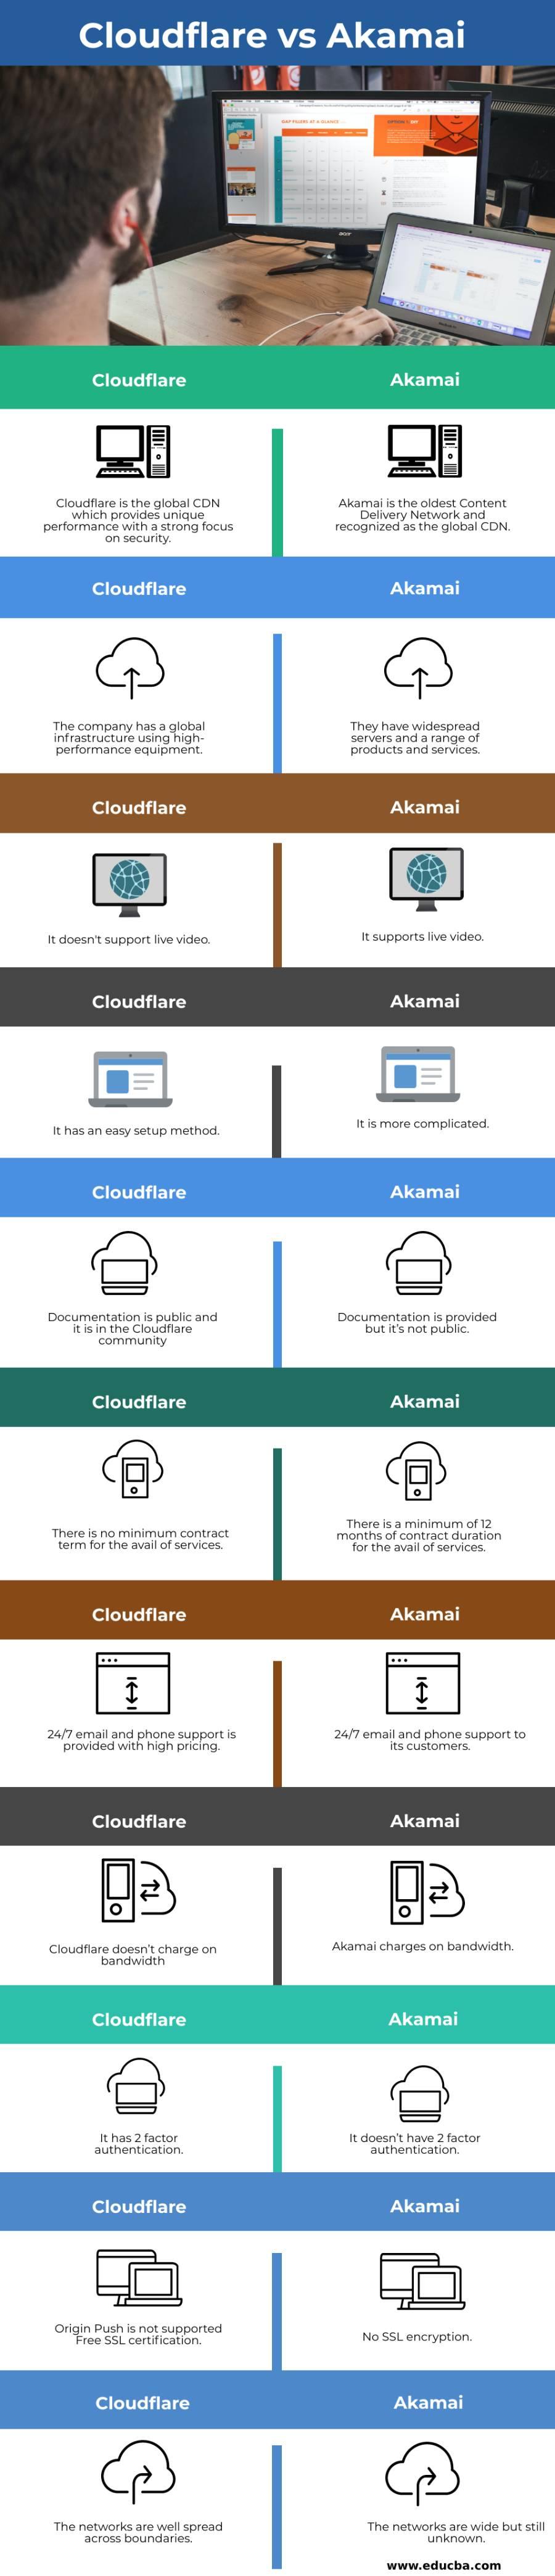 Cloudflare vs Akamai info